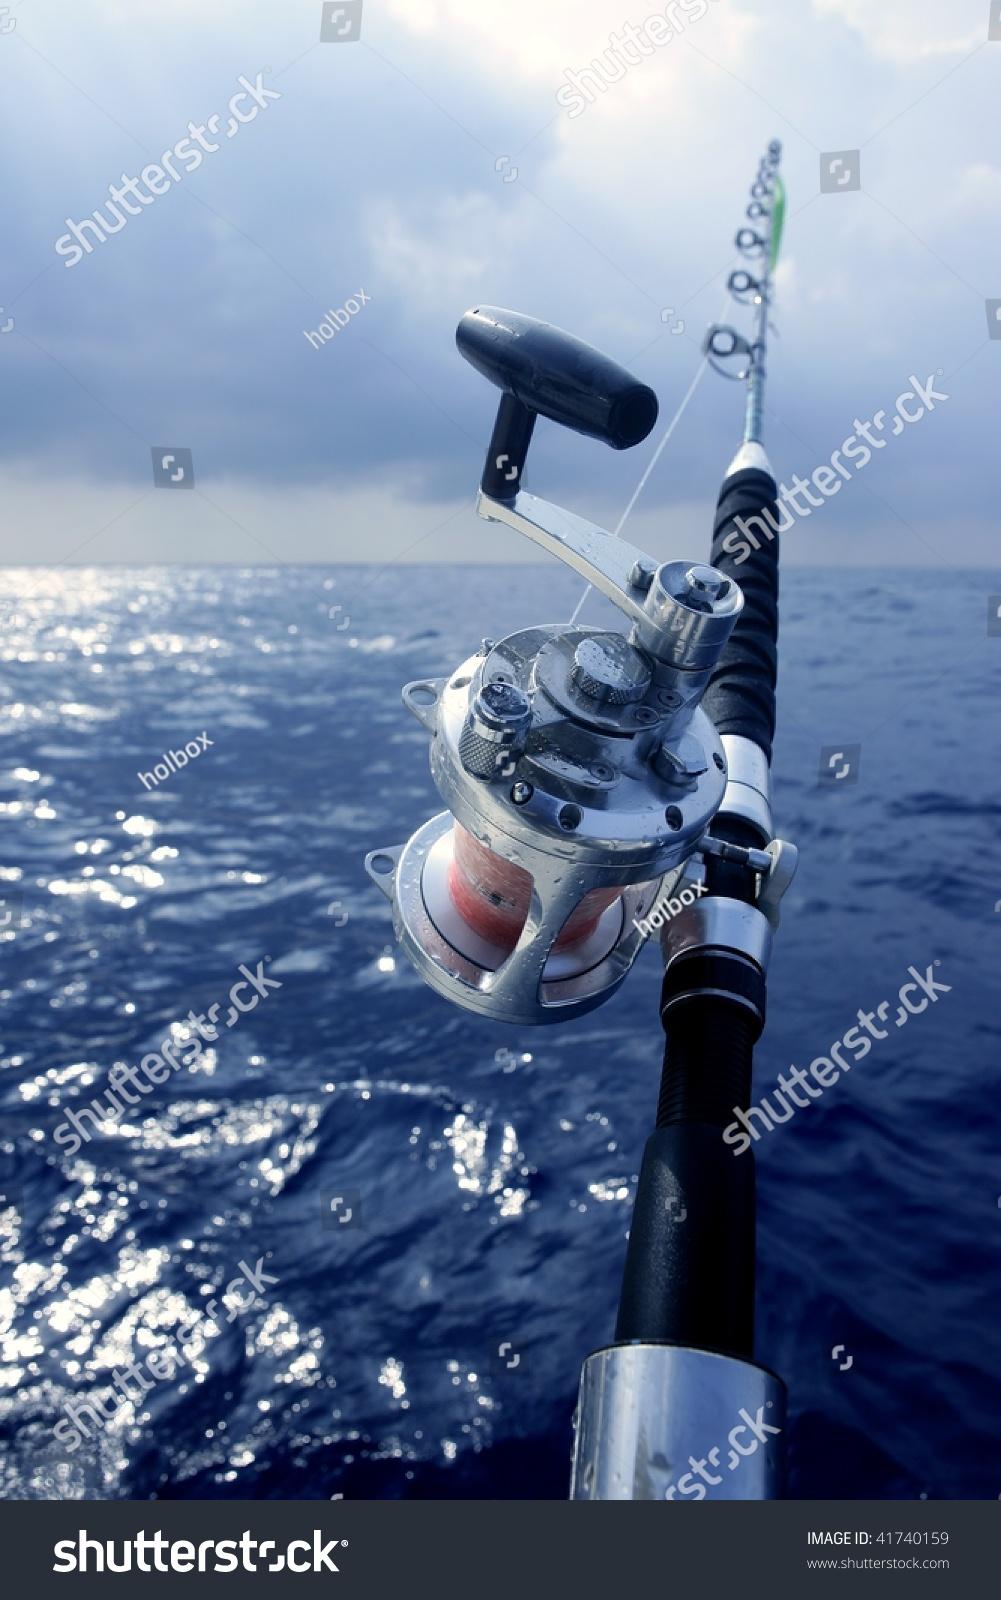 Big game boat fishing deep sea stock photo 41740159 for Sea fishing games